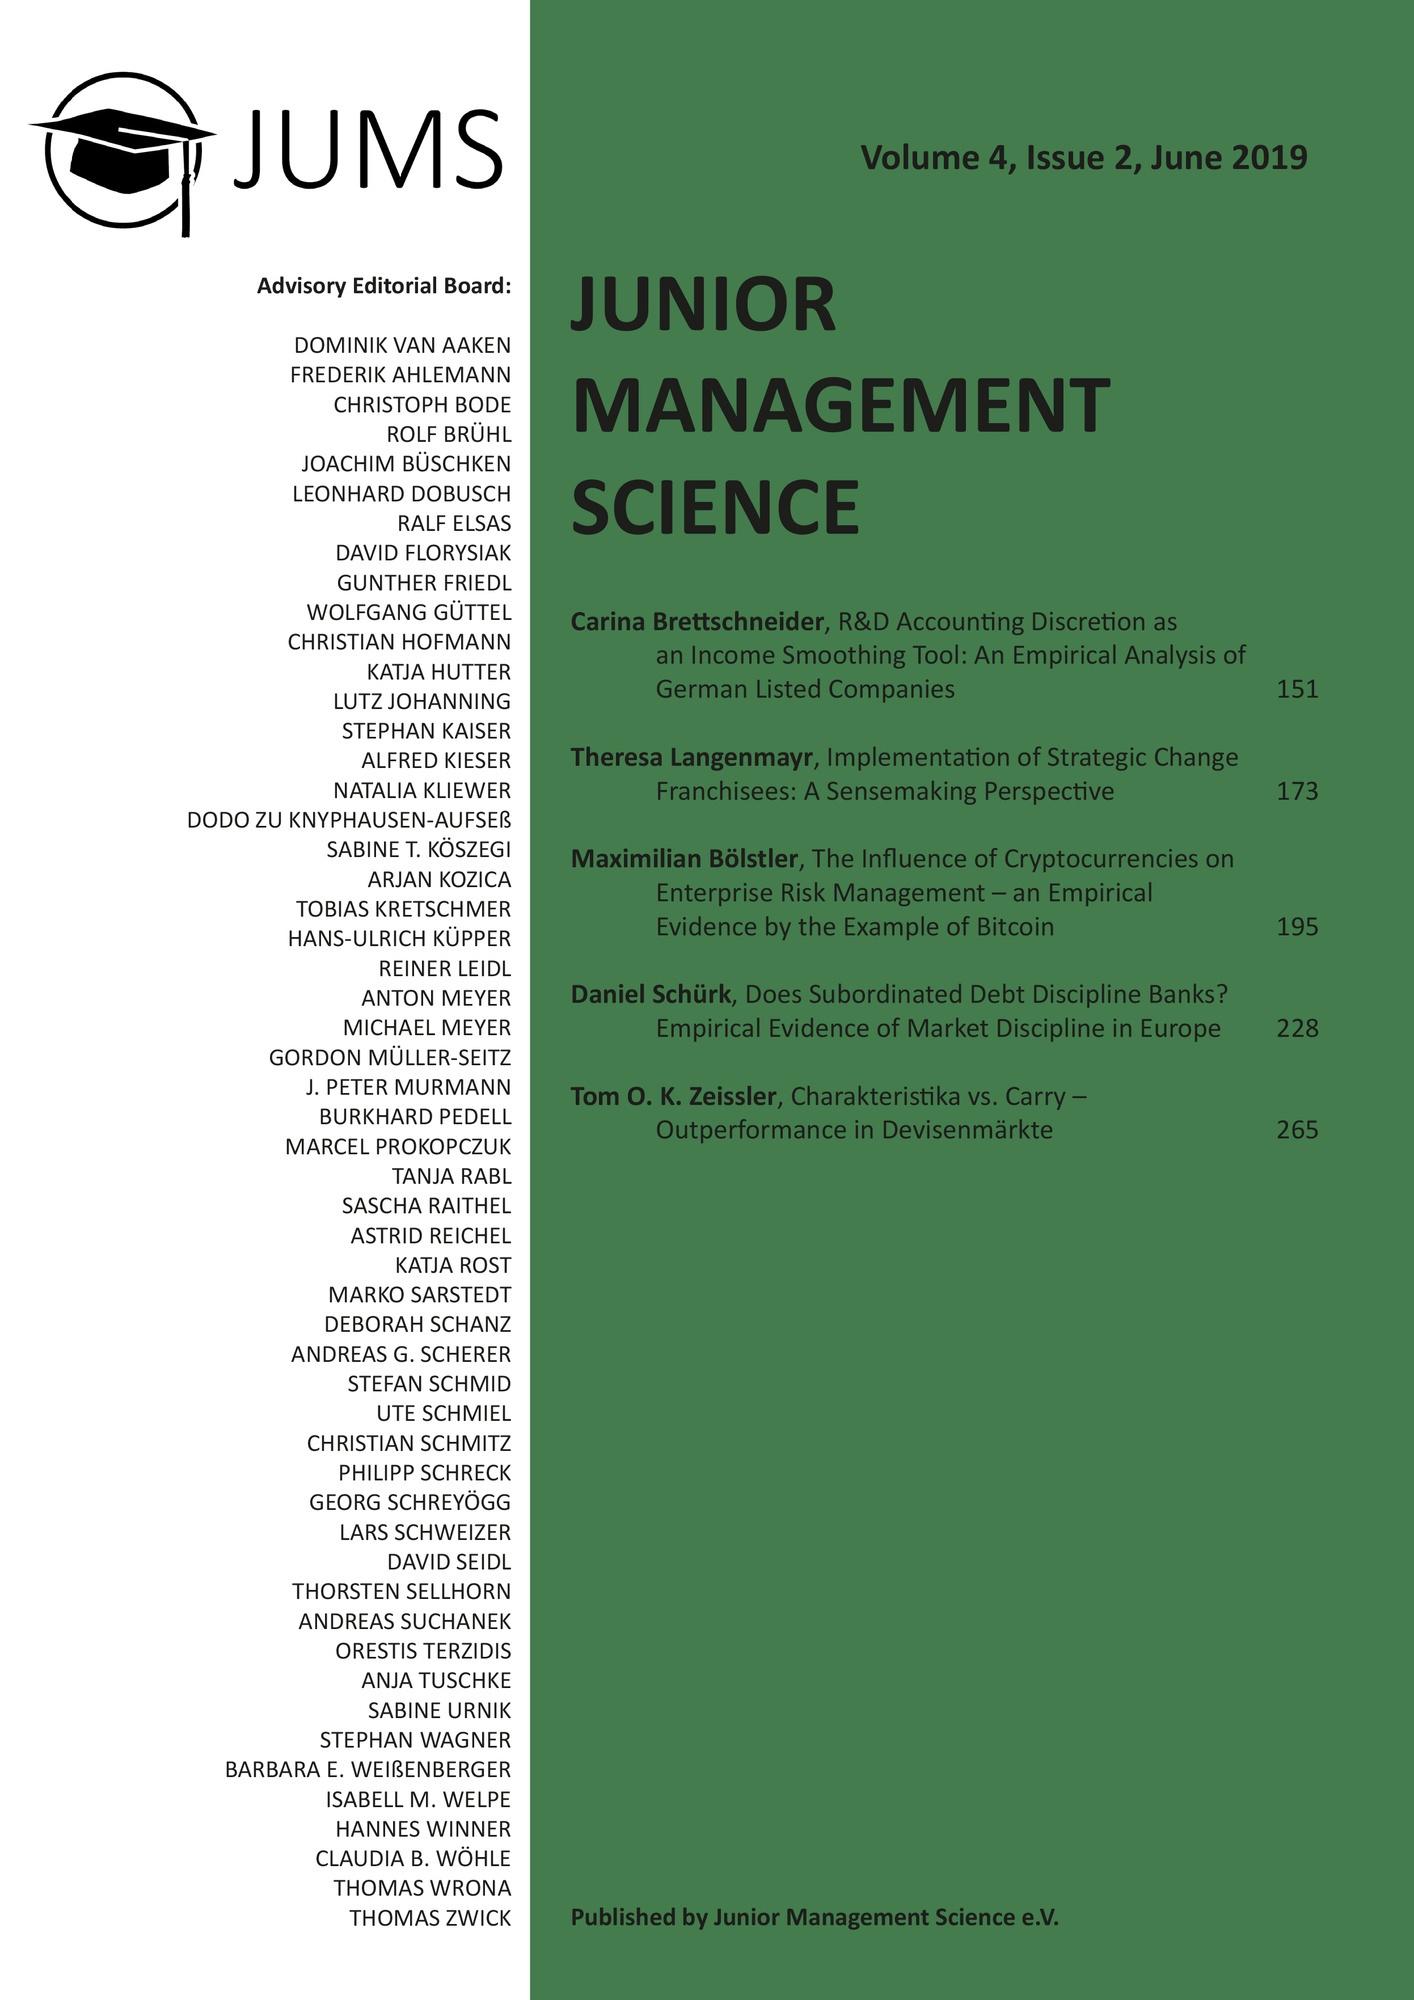 Titel: Junior Management Science, Volume 4, Issue 2, June 2019